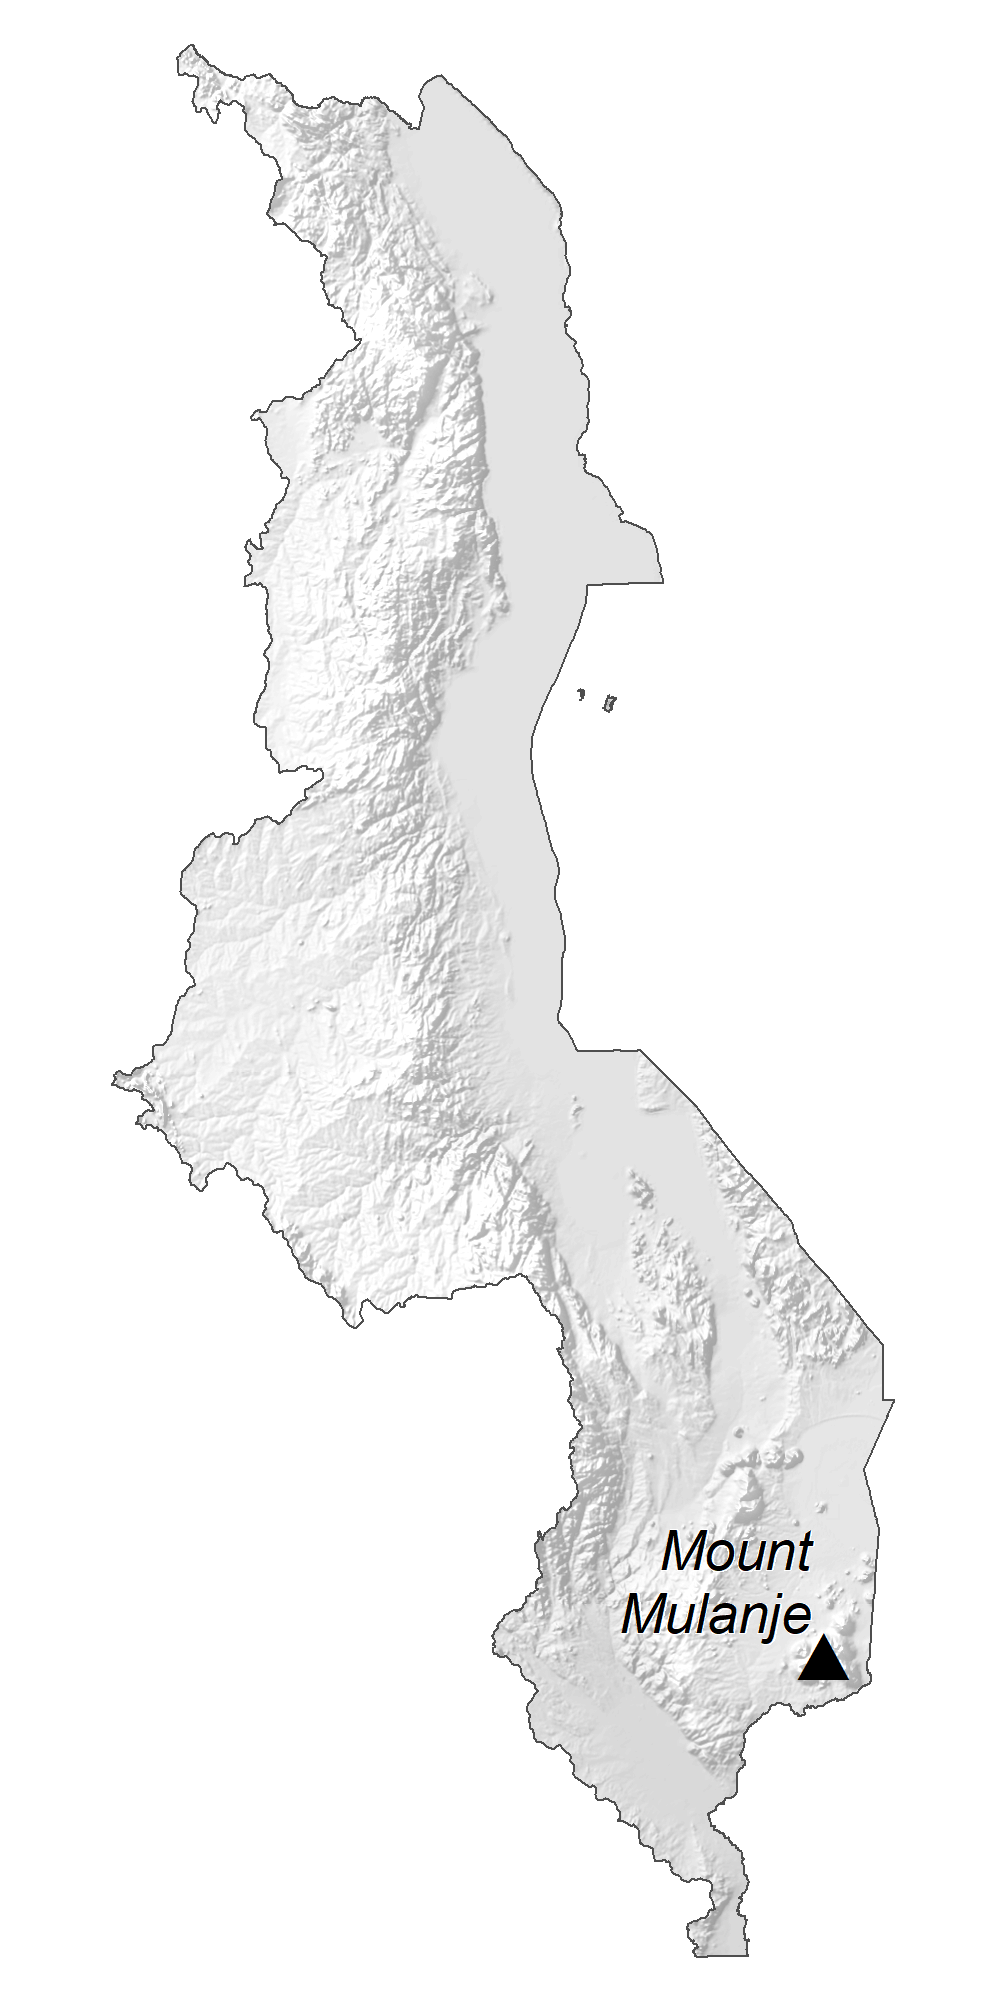 Malawi Elevation Map